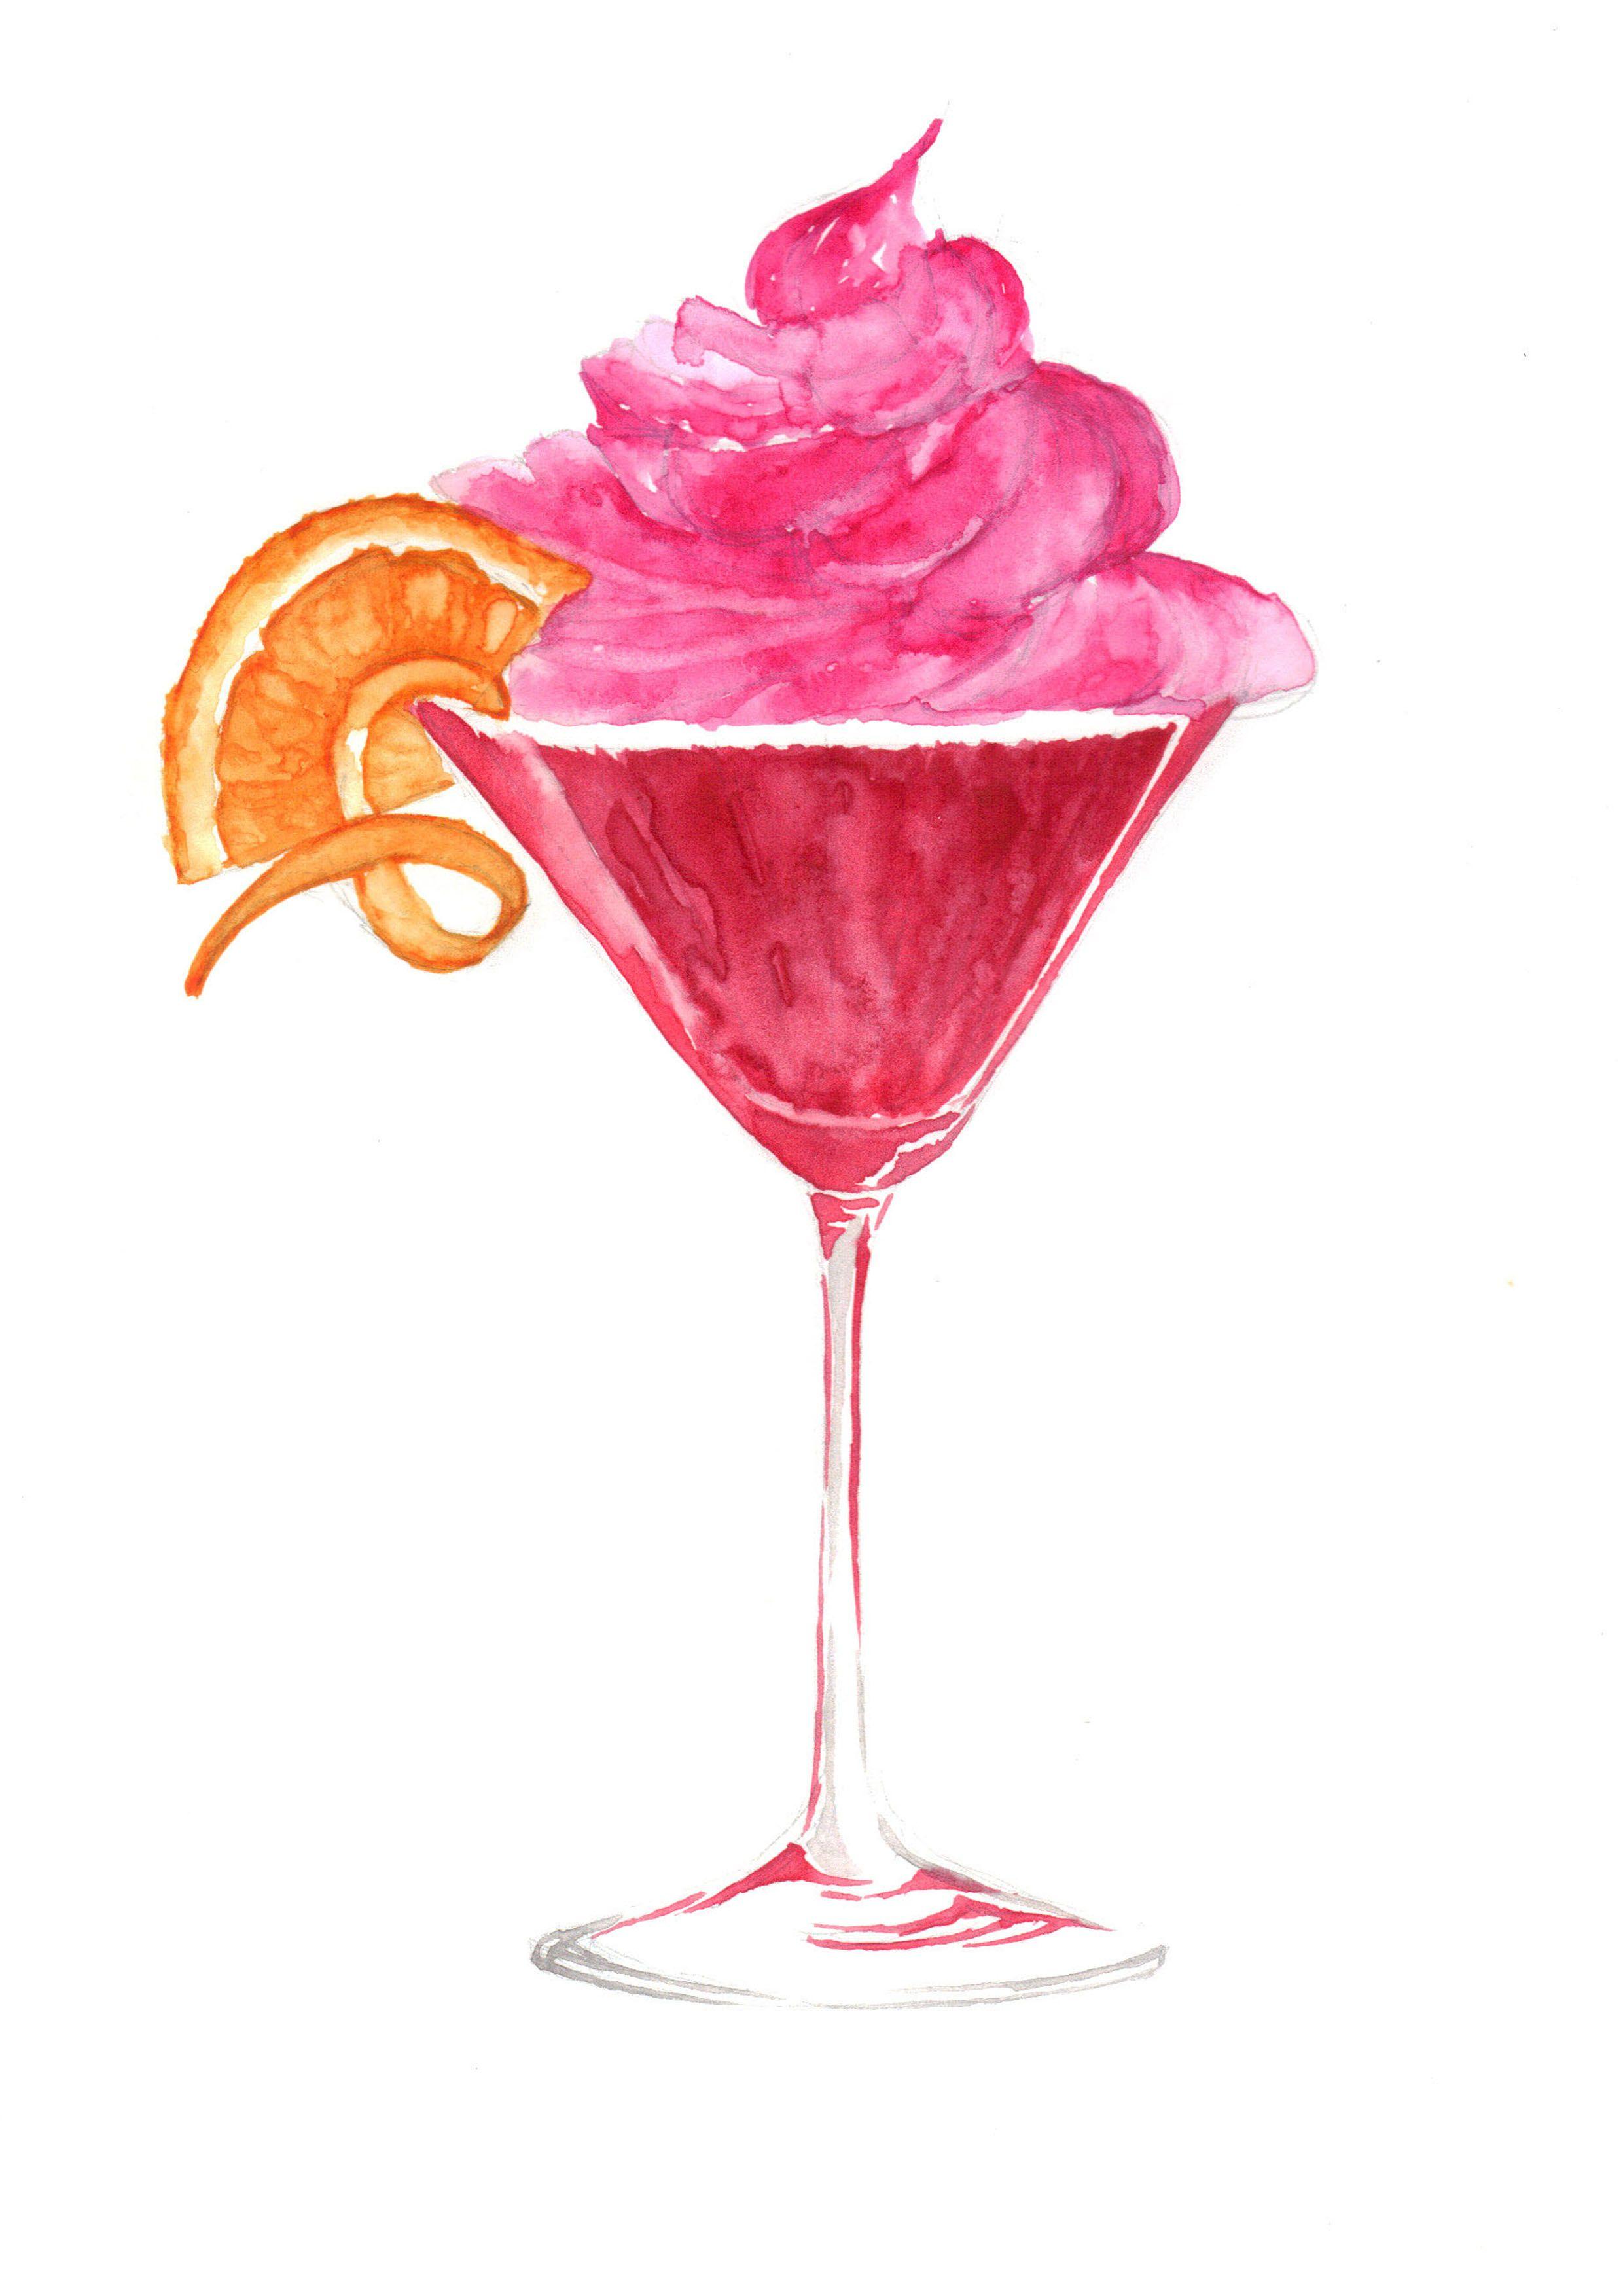 Cosmopolitan Cocktail Cupcake Watercolour. http://www.claireelizabethartwork.com/